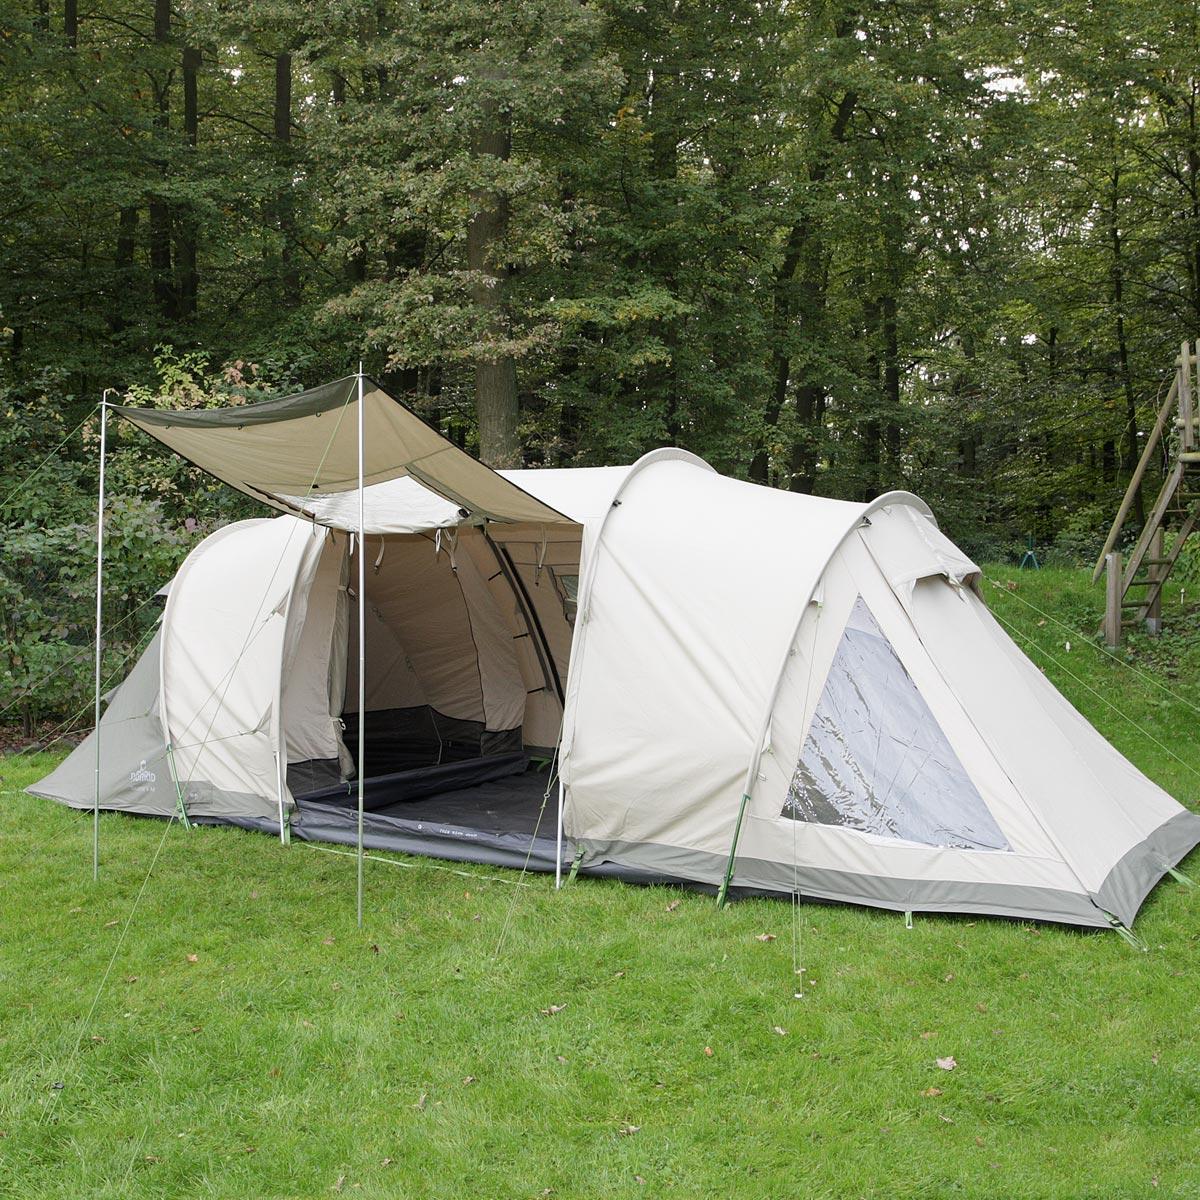 nomad touarec 5 air familien tunnelzelt 5 personen neu ebay. Black Bedroom Furniture Sets. Home Design Ideas